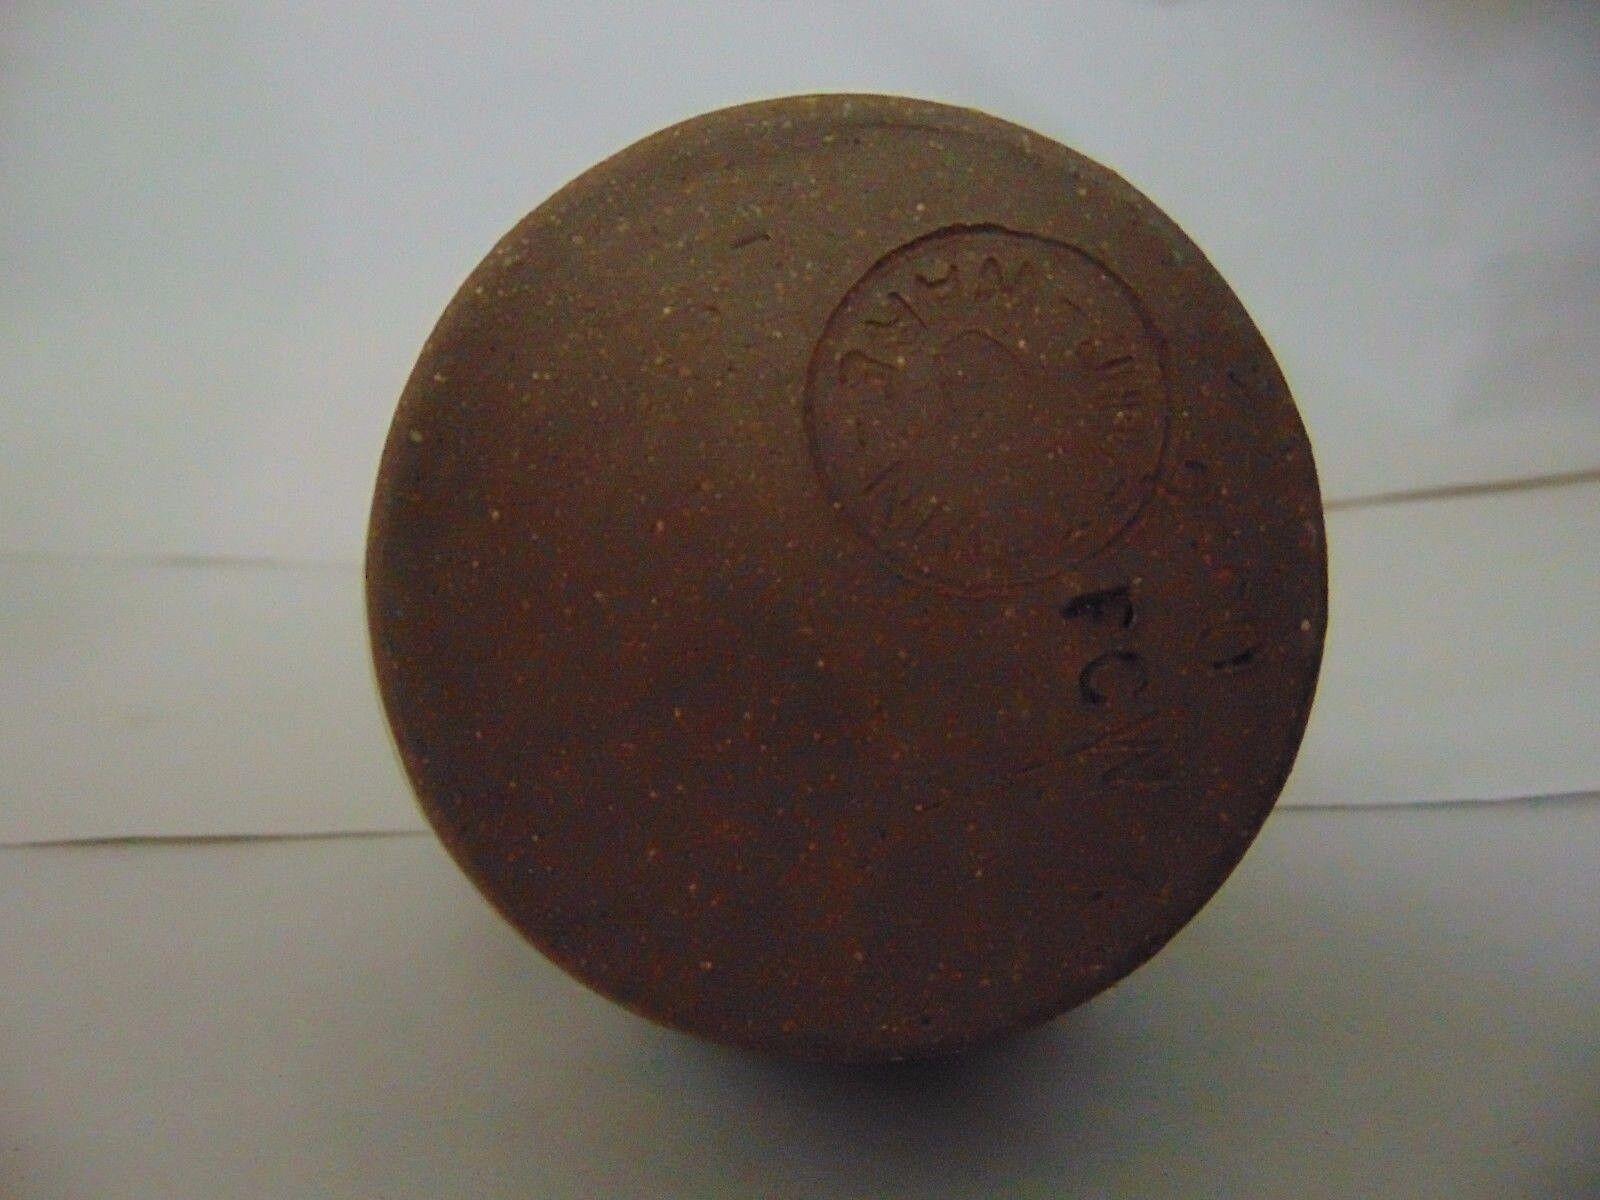 DON CRAIG JUGTOWN WARE SOUTHERN PRIMITIVE FOLK ART MINI PITCHER SHJ - $39.95